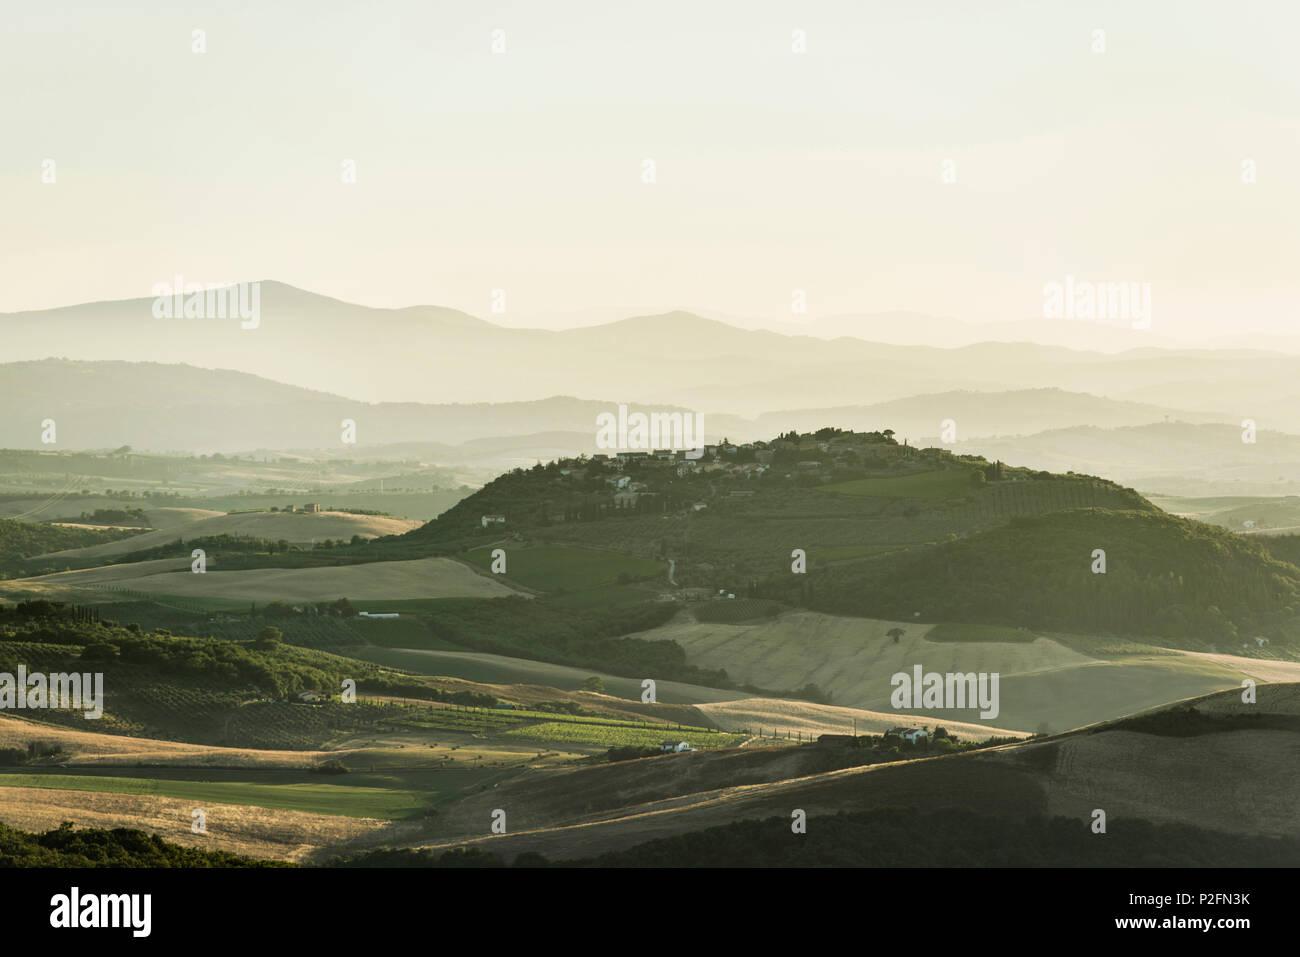 landscape near Arcidosso, province of Grosseto, Tuscany, Italy - Stock Image